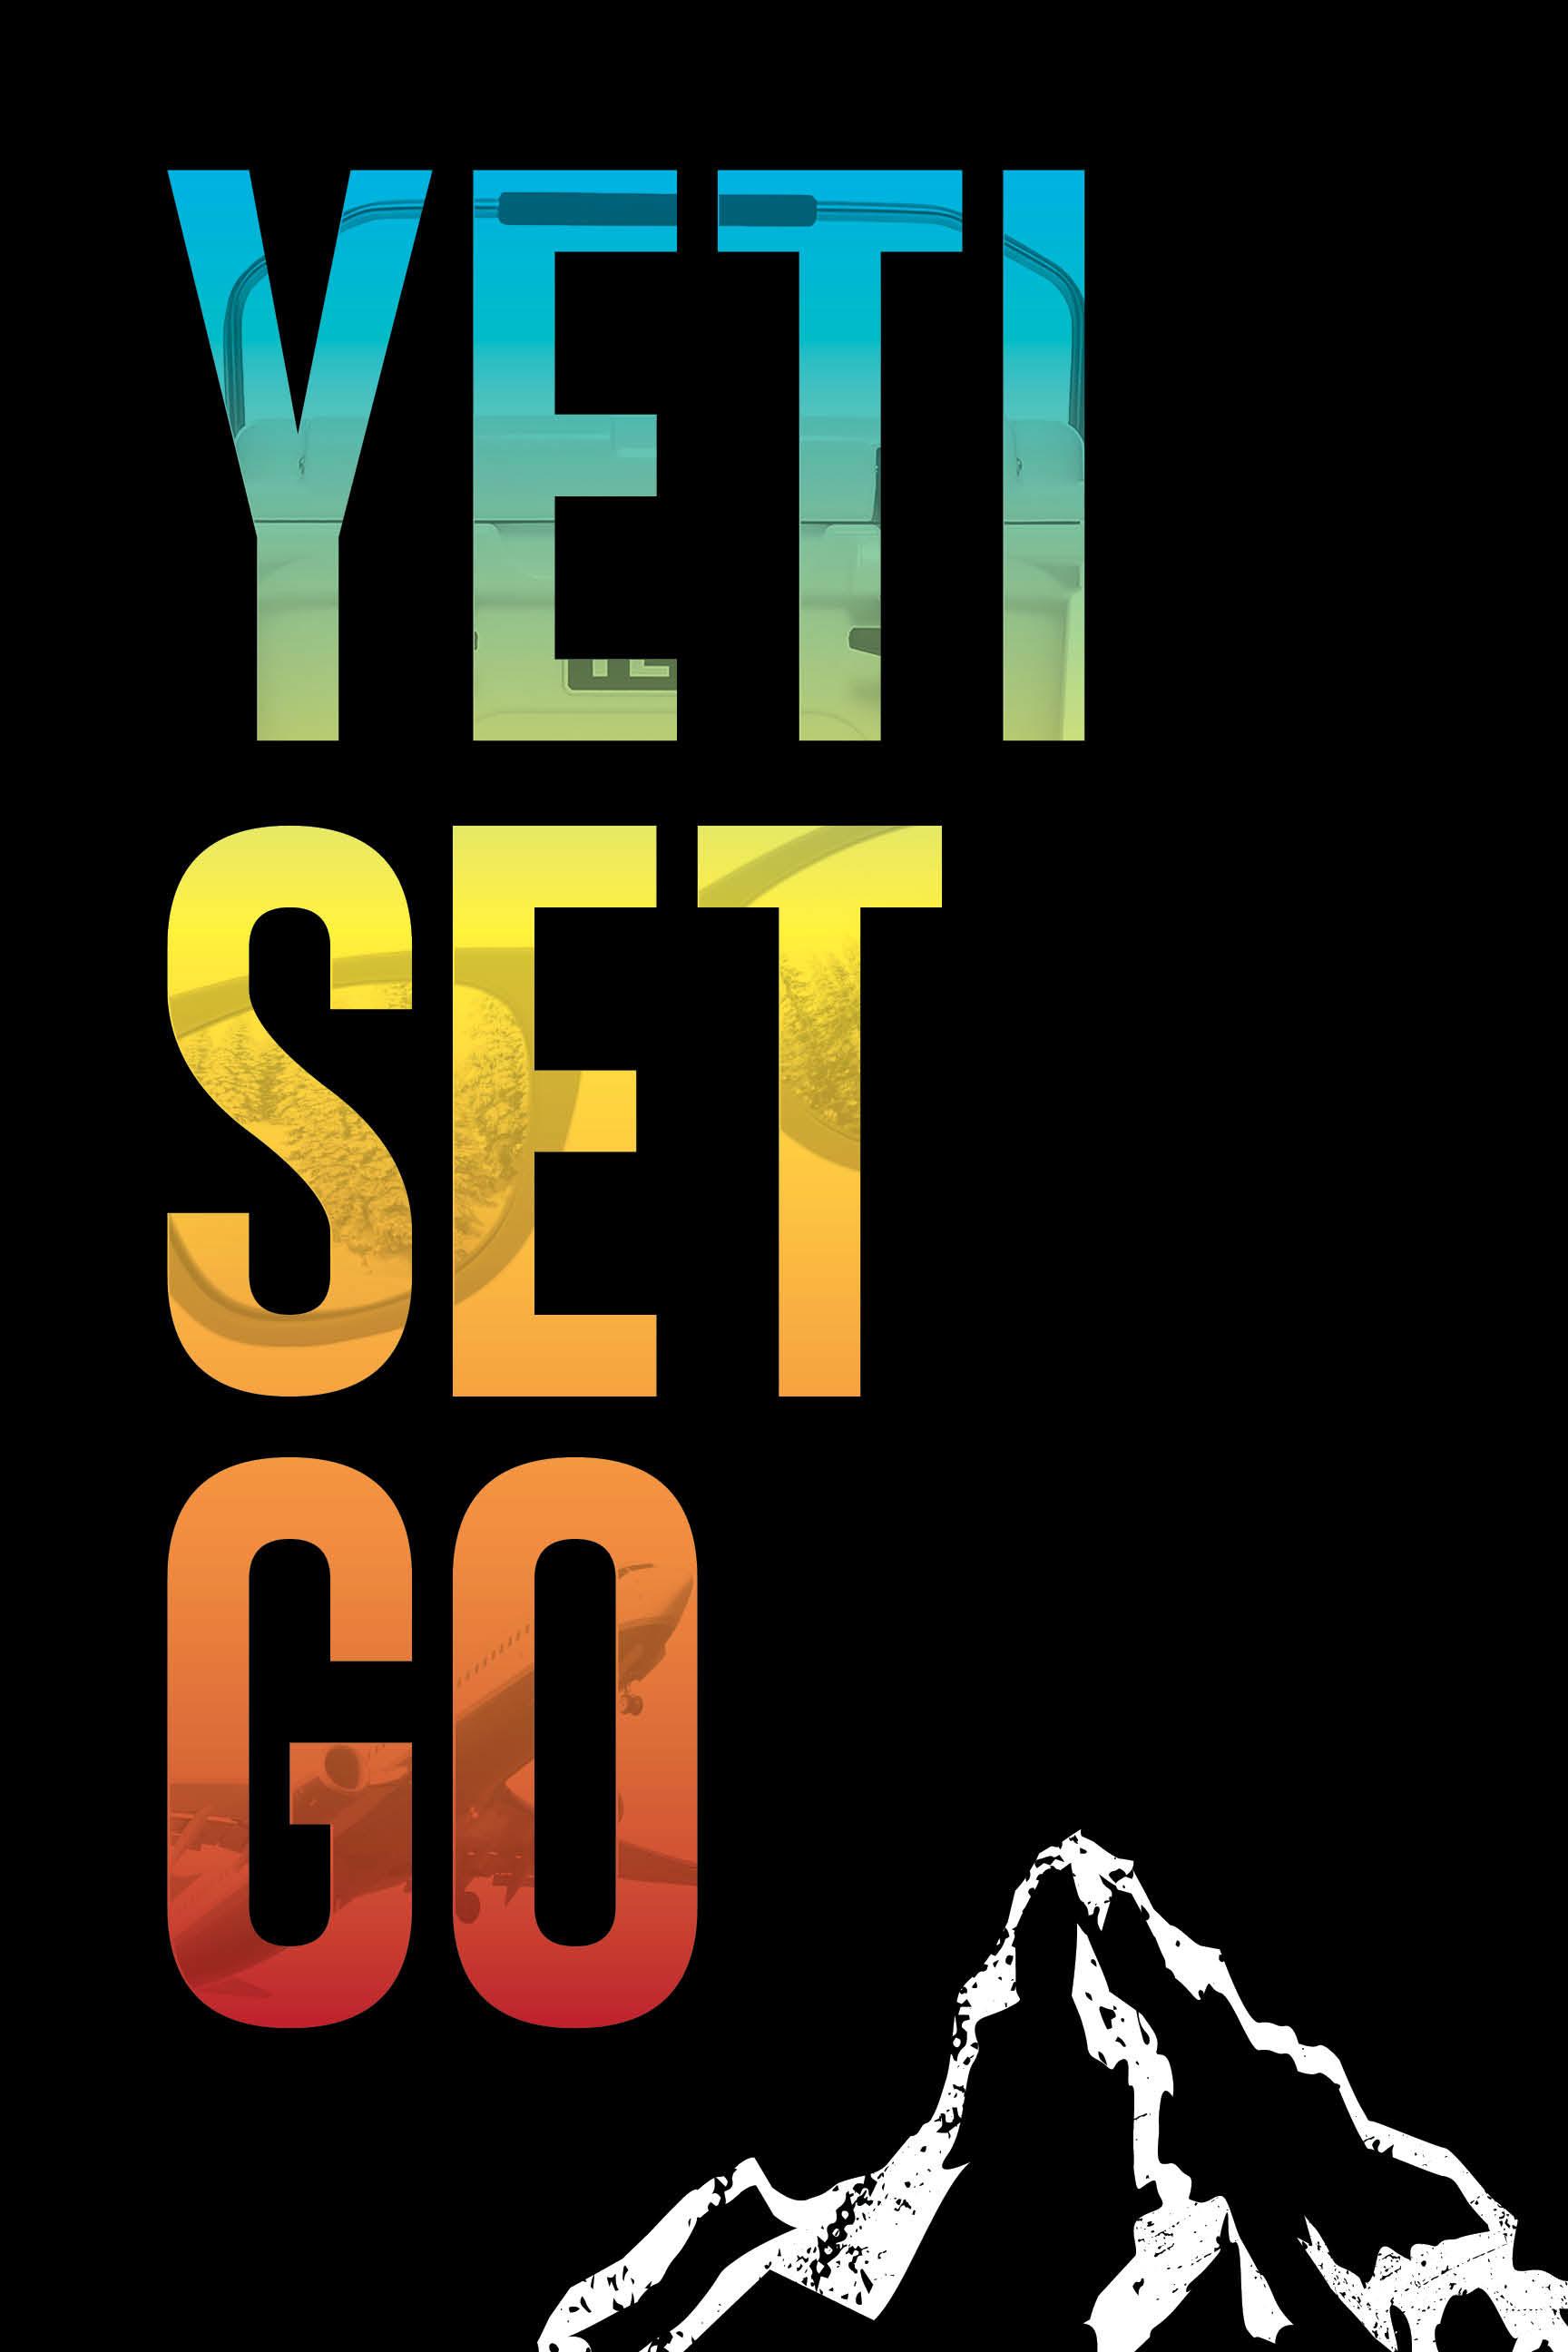 Yeti, Set, Go! Spring Break Promotion on Behance